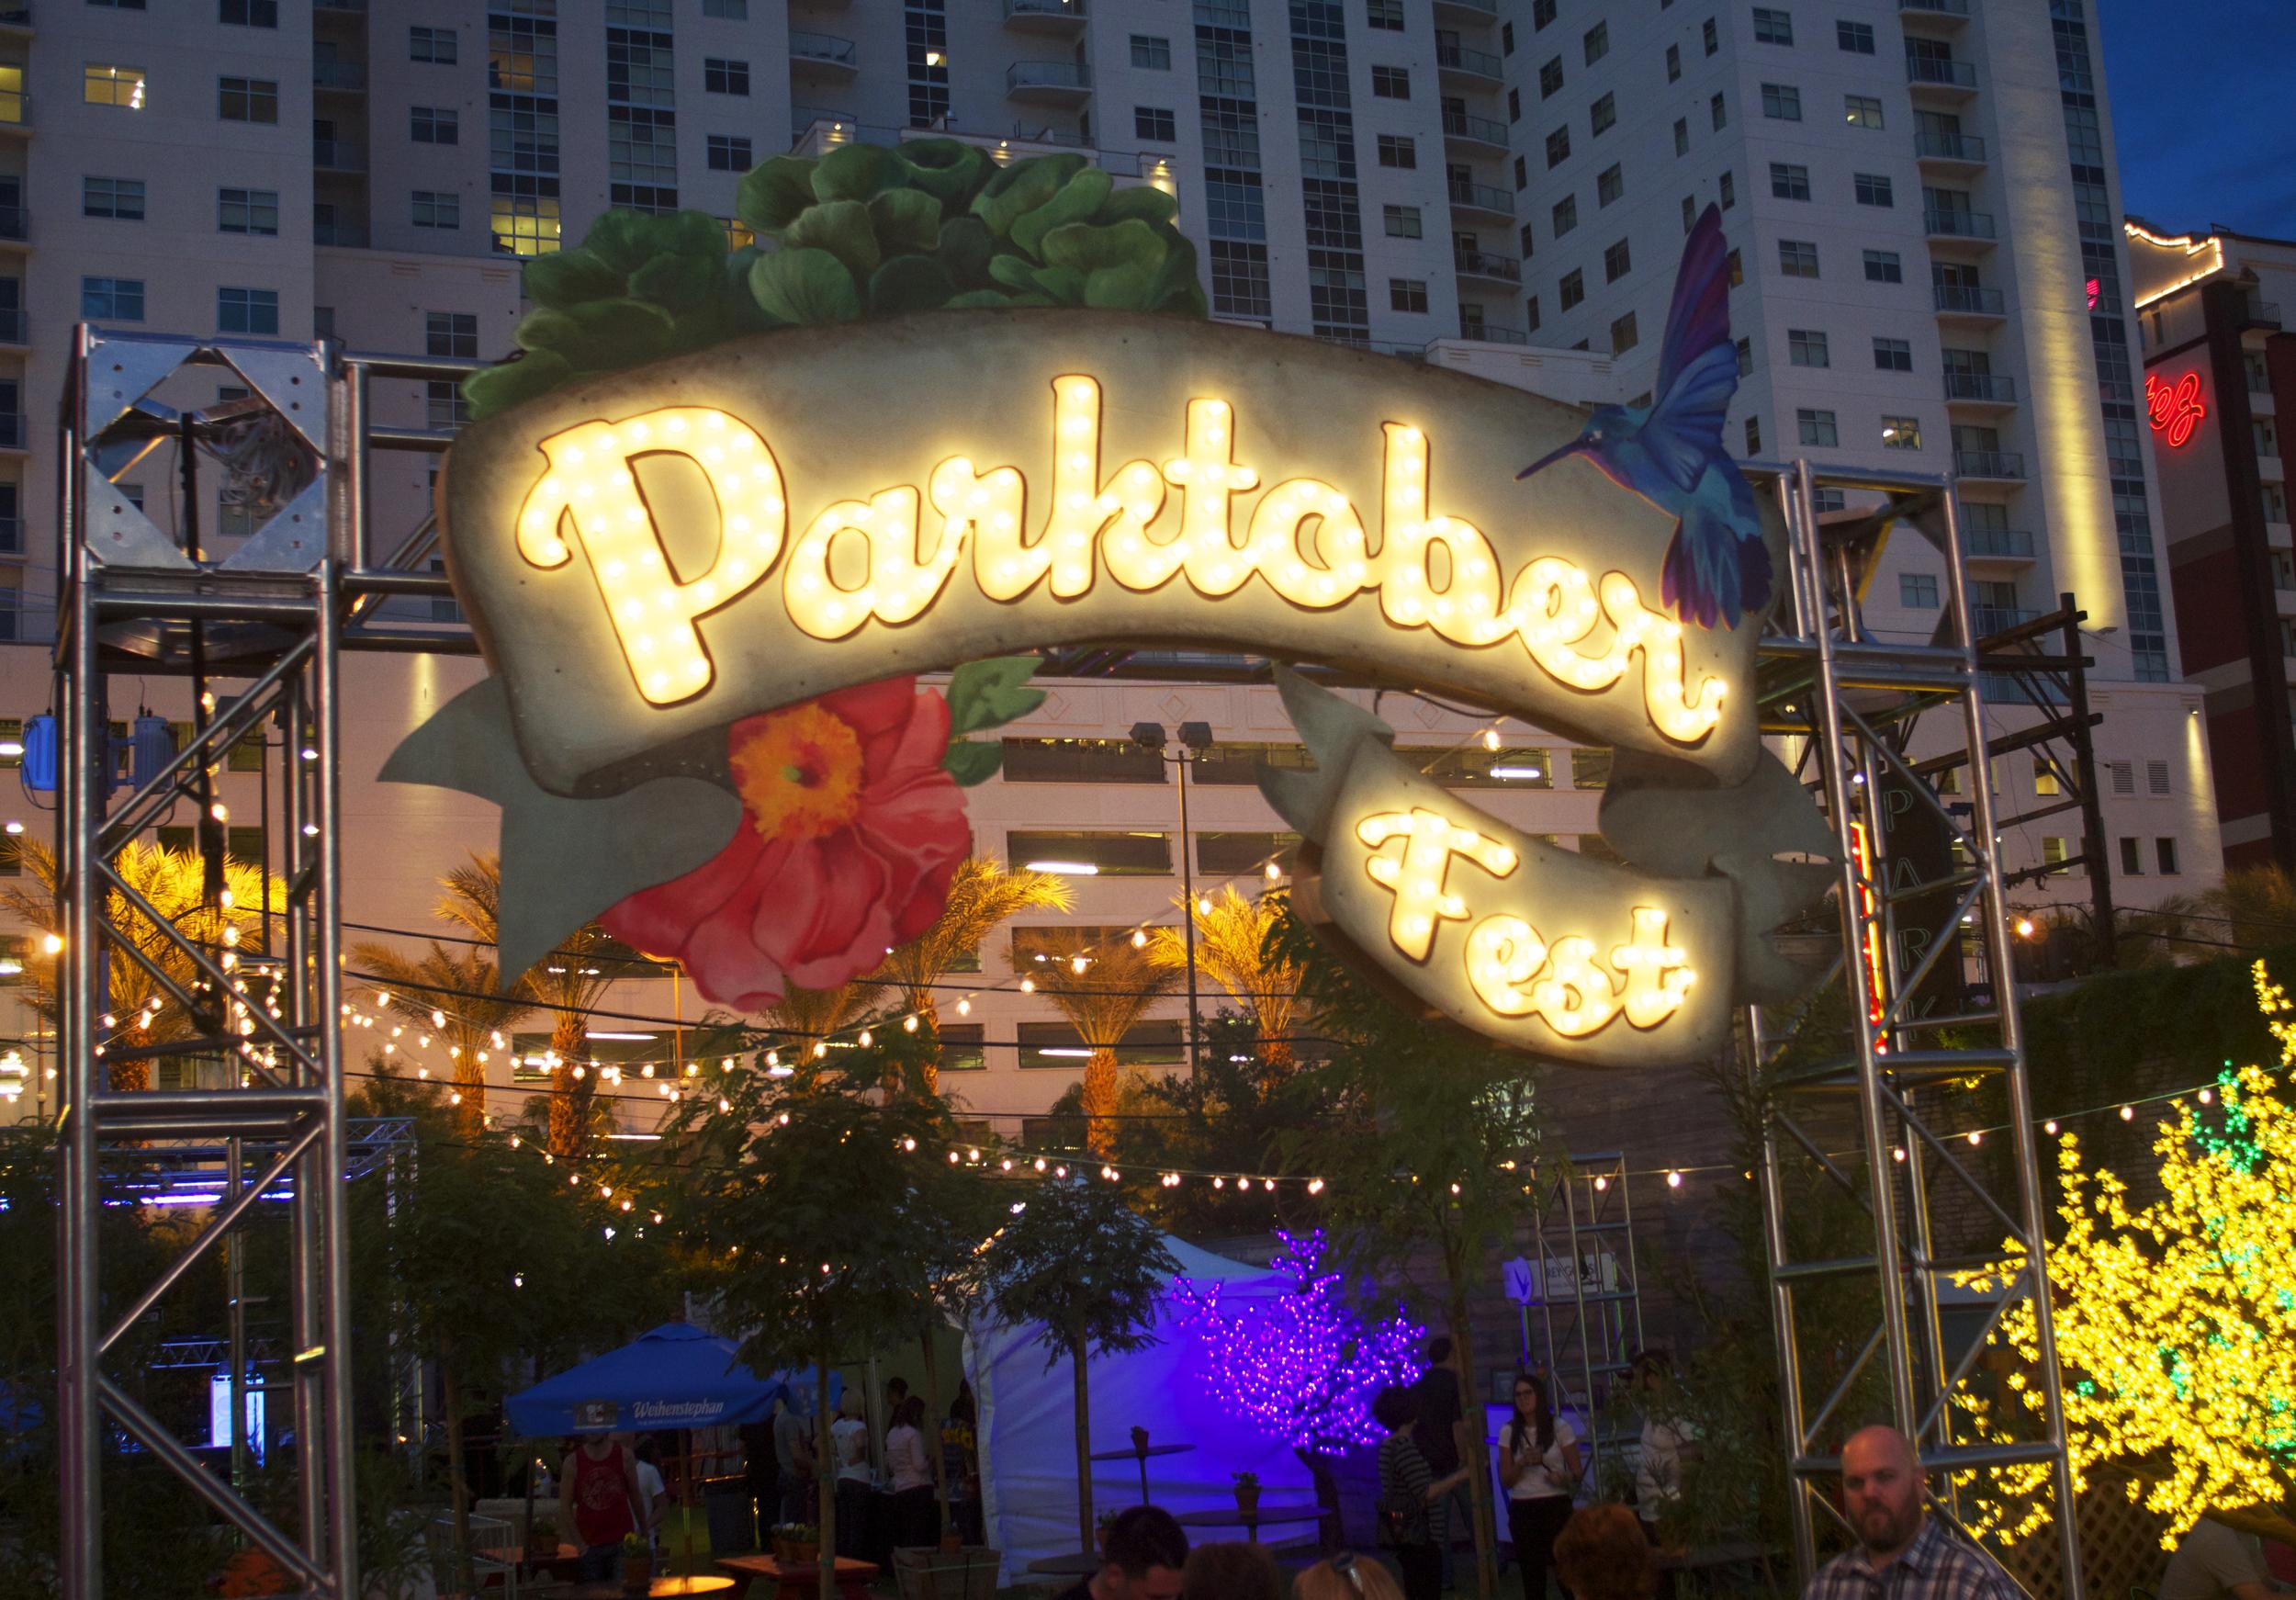 parktober fest night.jpg